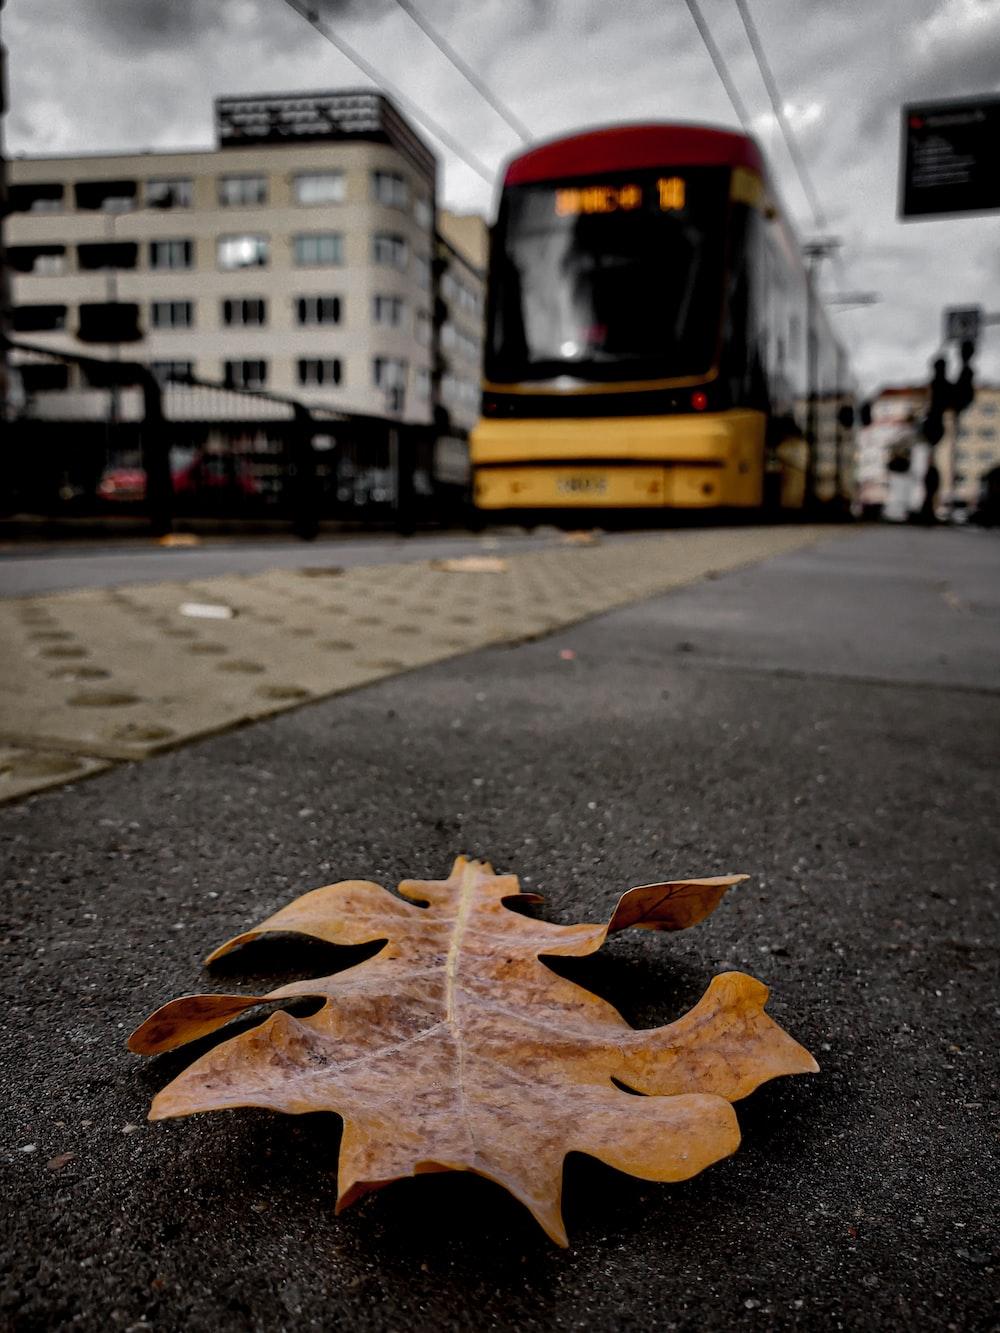 dried leaf on pavement